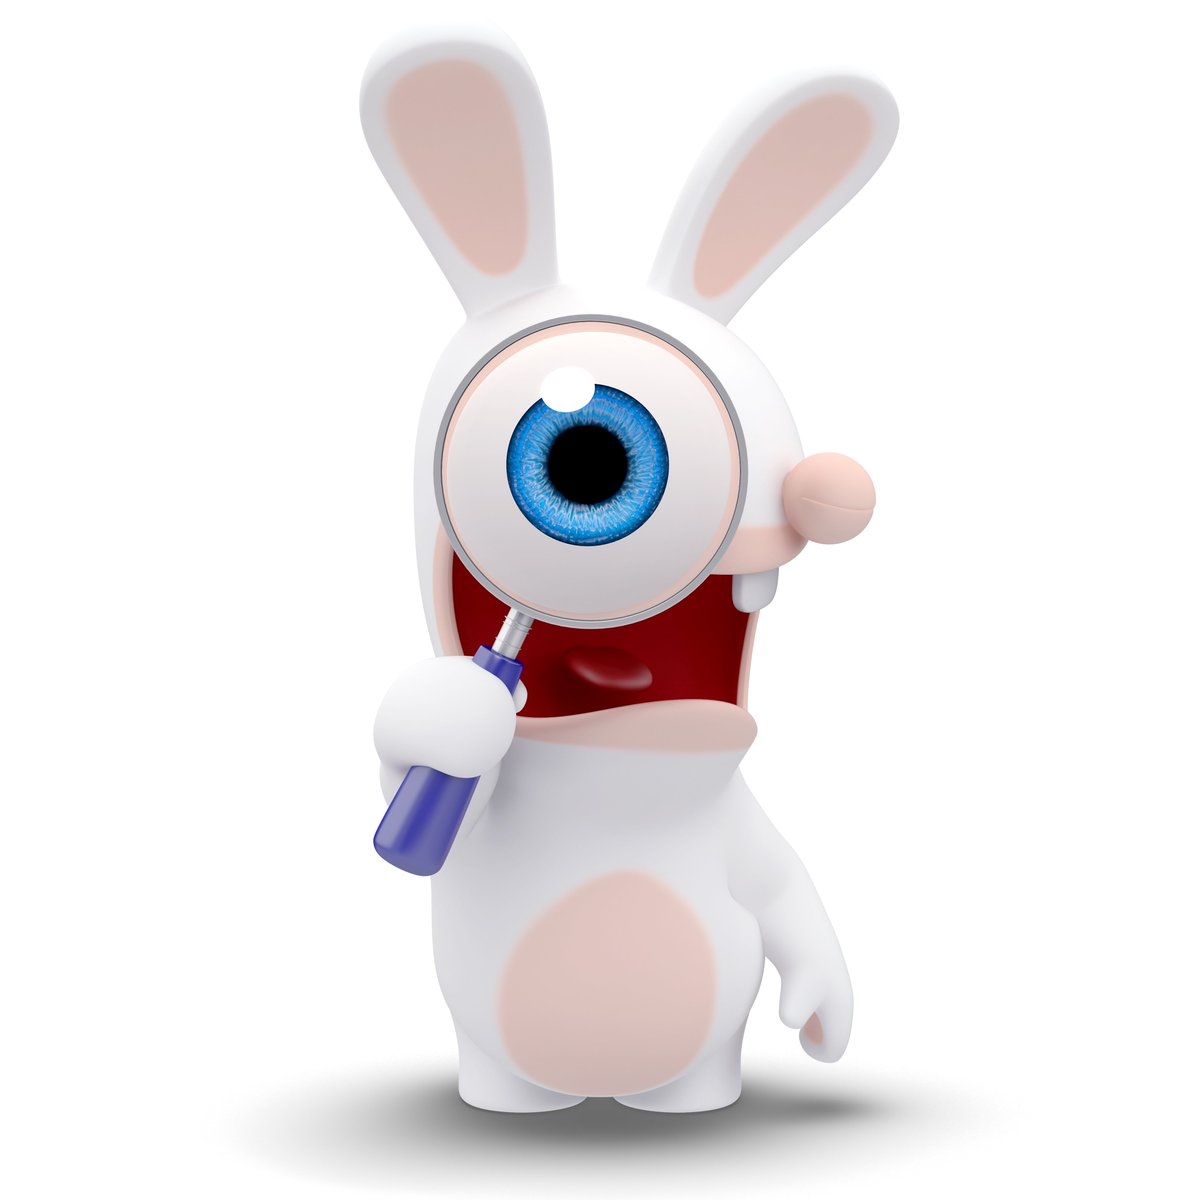 Les lapins cr tins lapinscretins twitter - Lapin cretin image ...